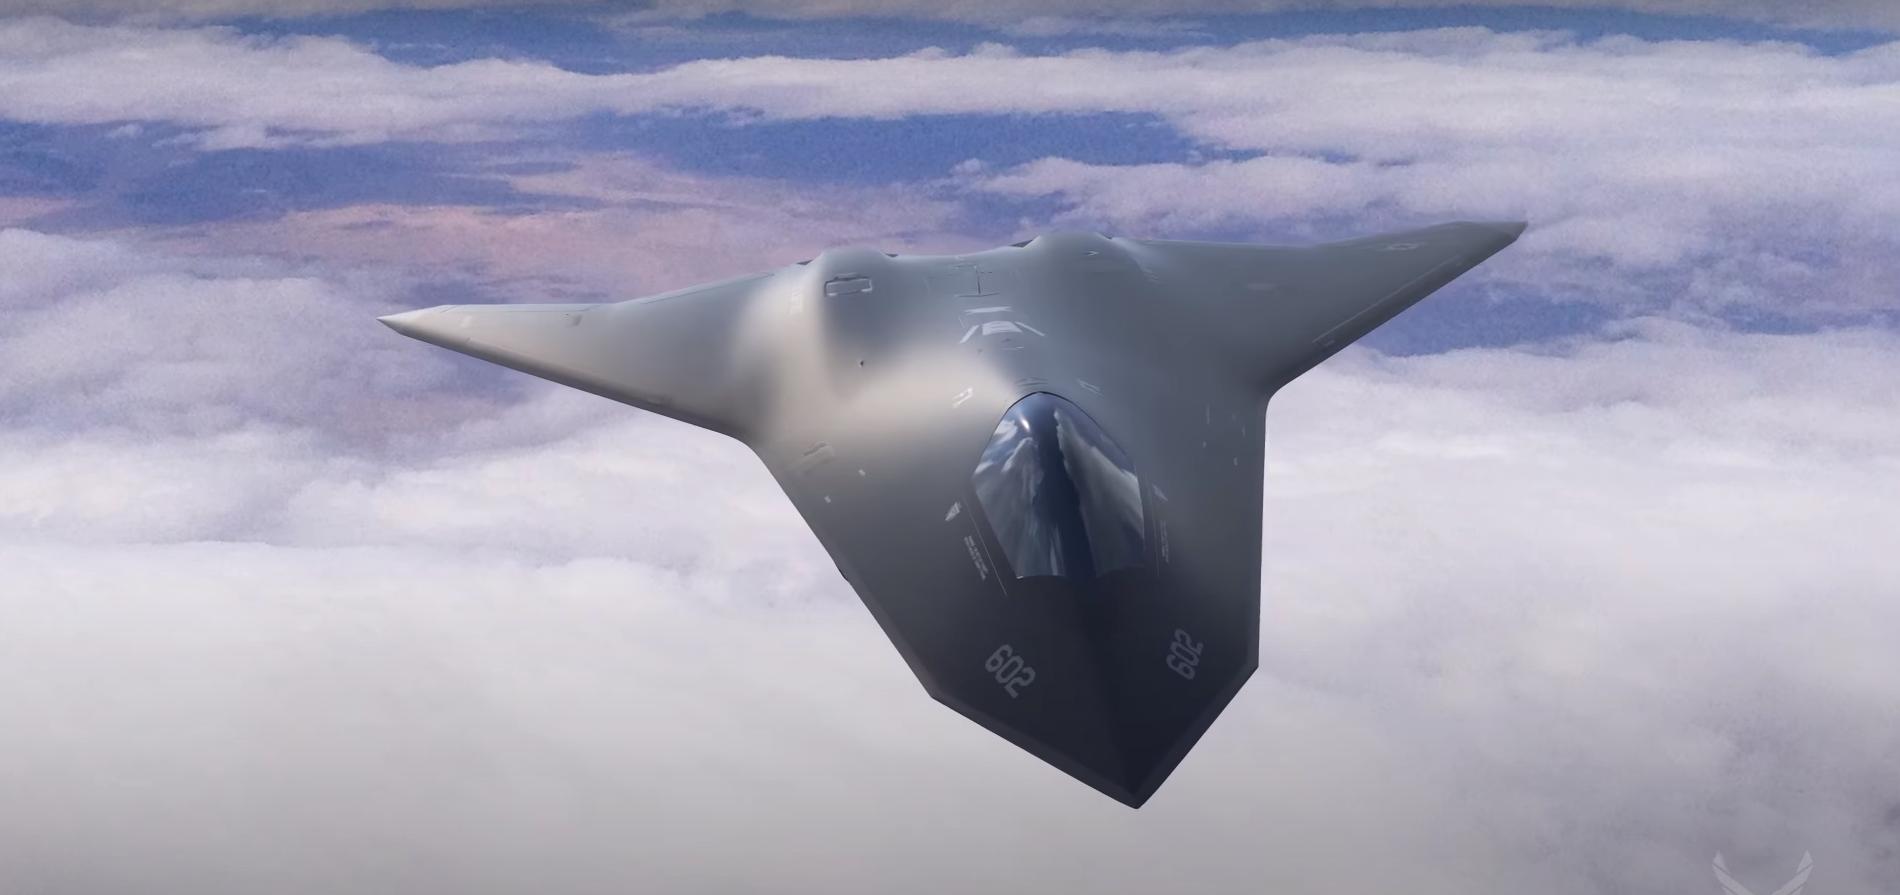 USAF secretly builds and flies next-generation fighter demonstrator | News | Flight Global